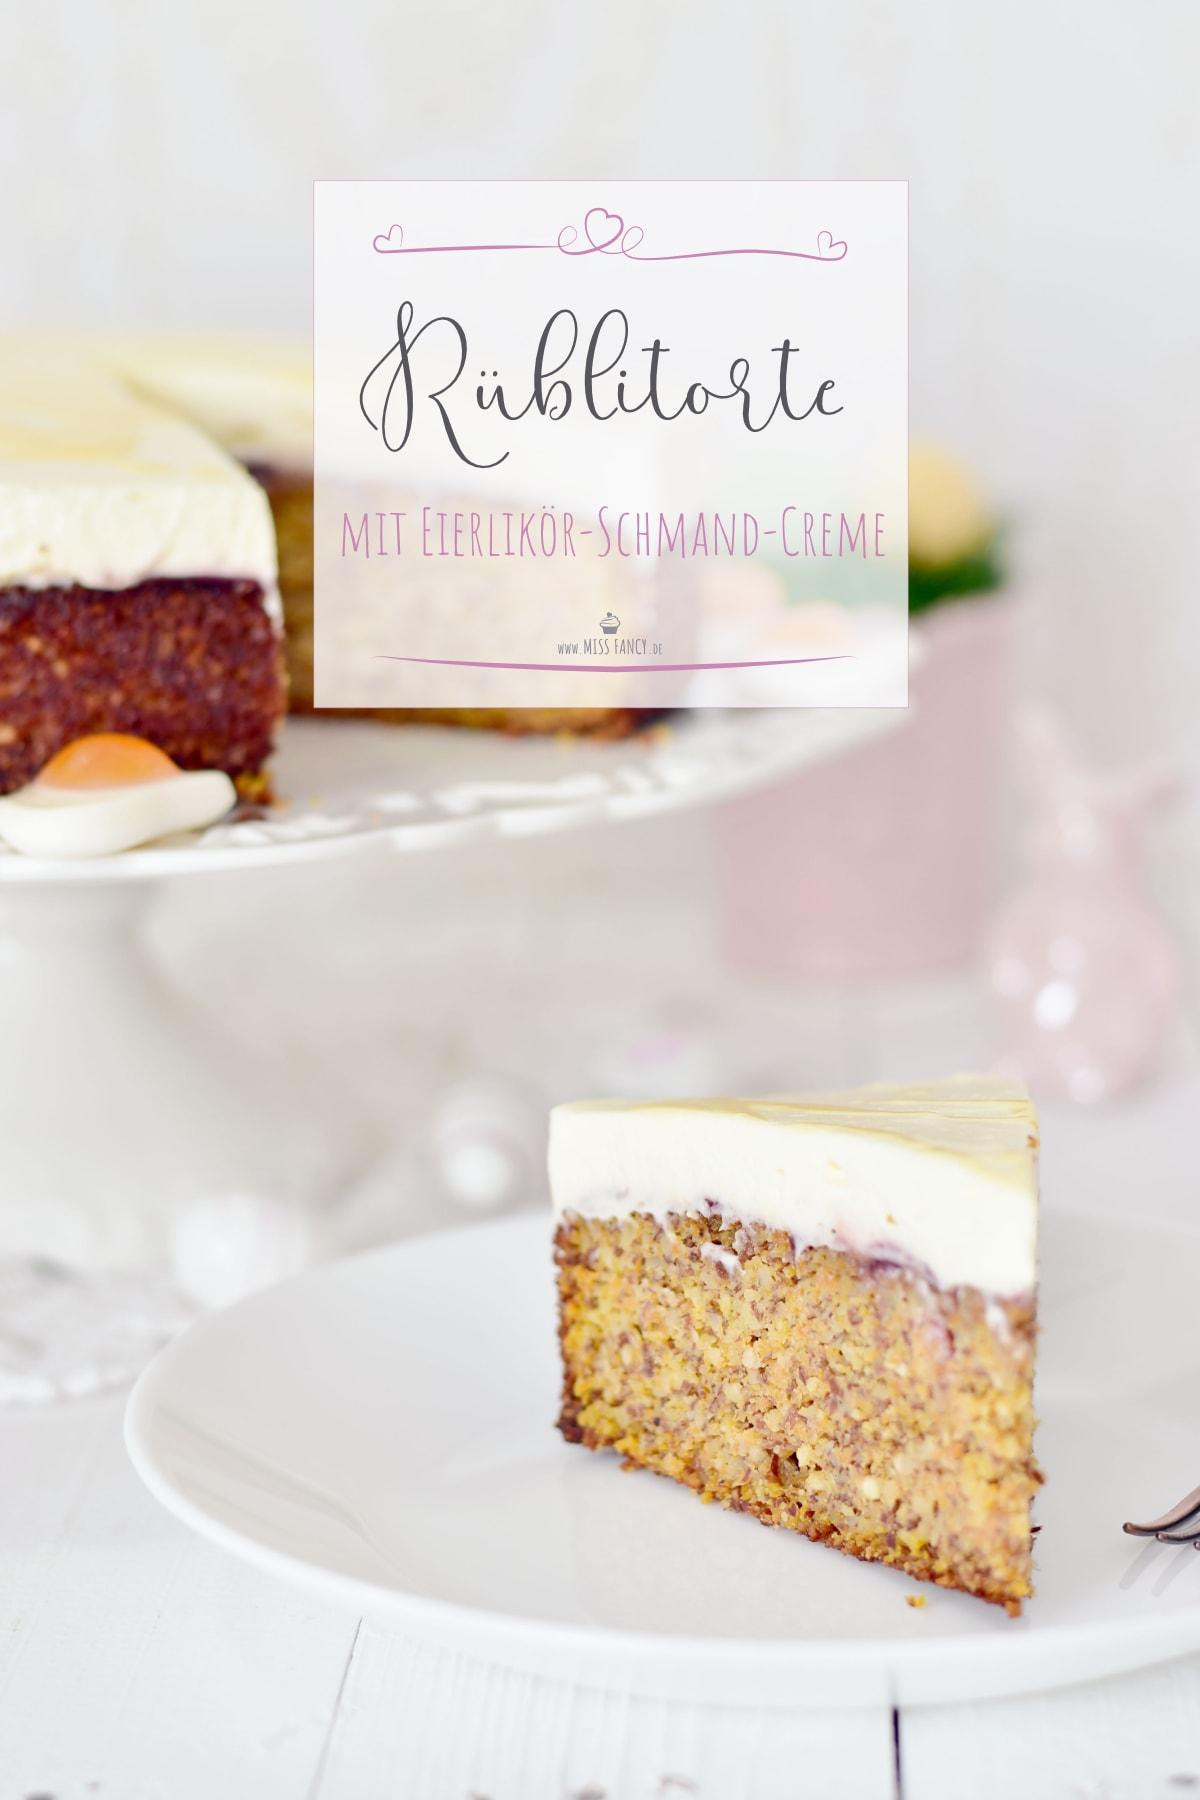 Rezept-Rüblitorte-Eierlikör-Schmand-Creme-min